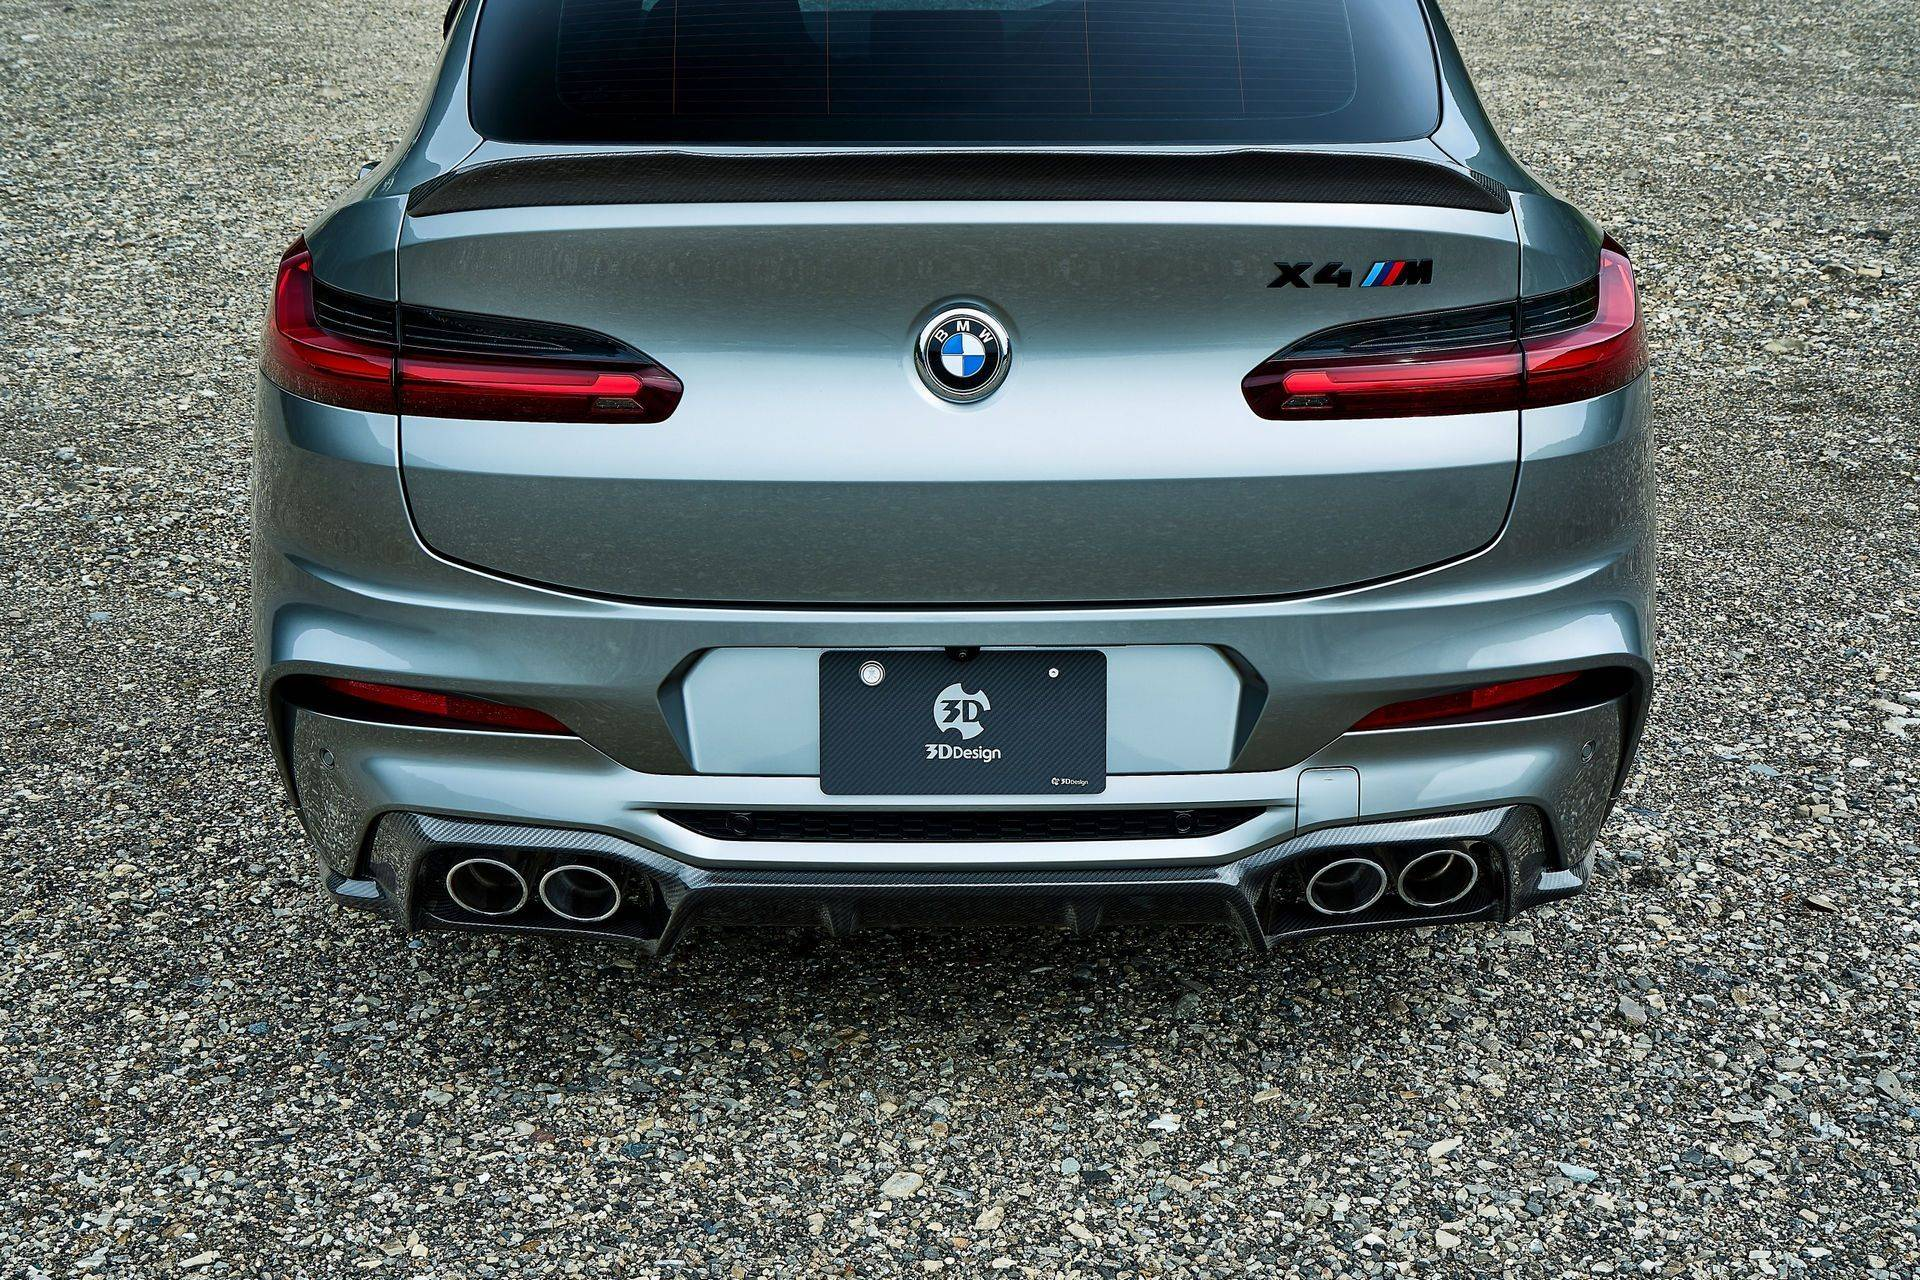 BMW-X4-M-by-3D-Design-14